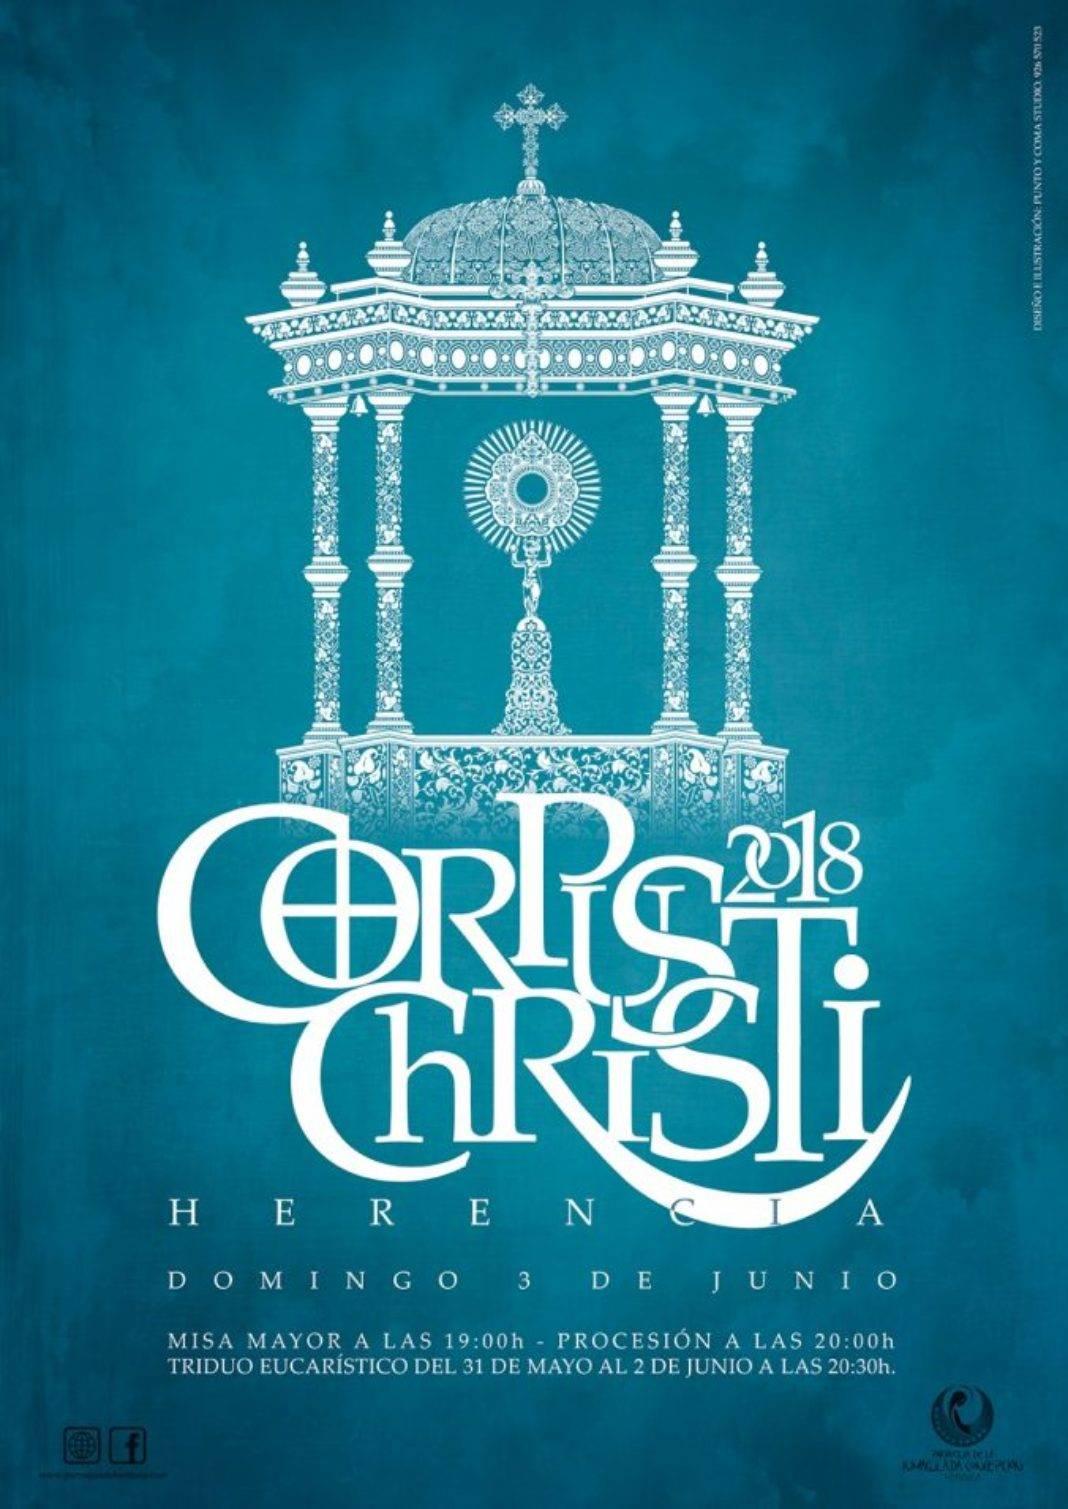 Herencia engalana sus calles para la festividad del Corpus Christi 10